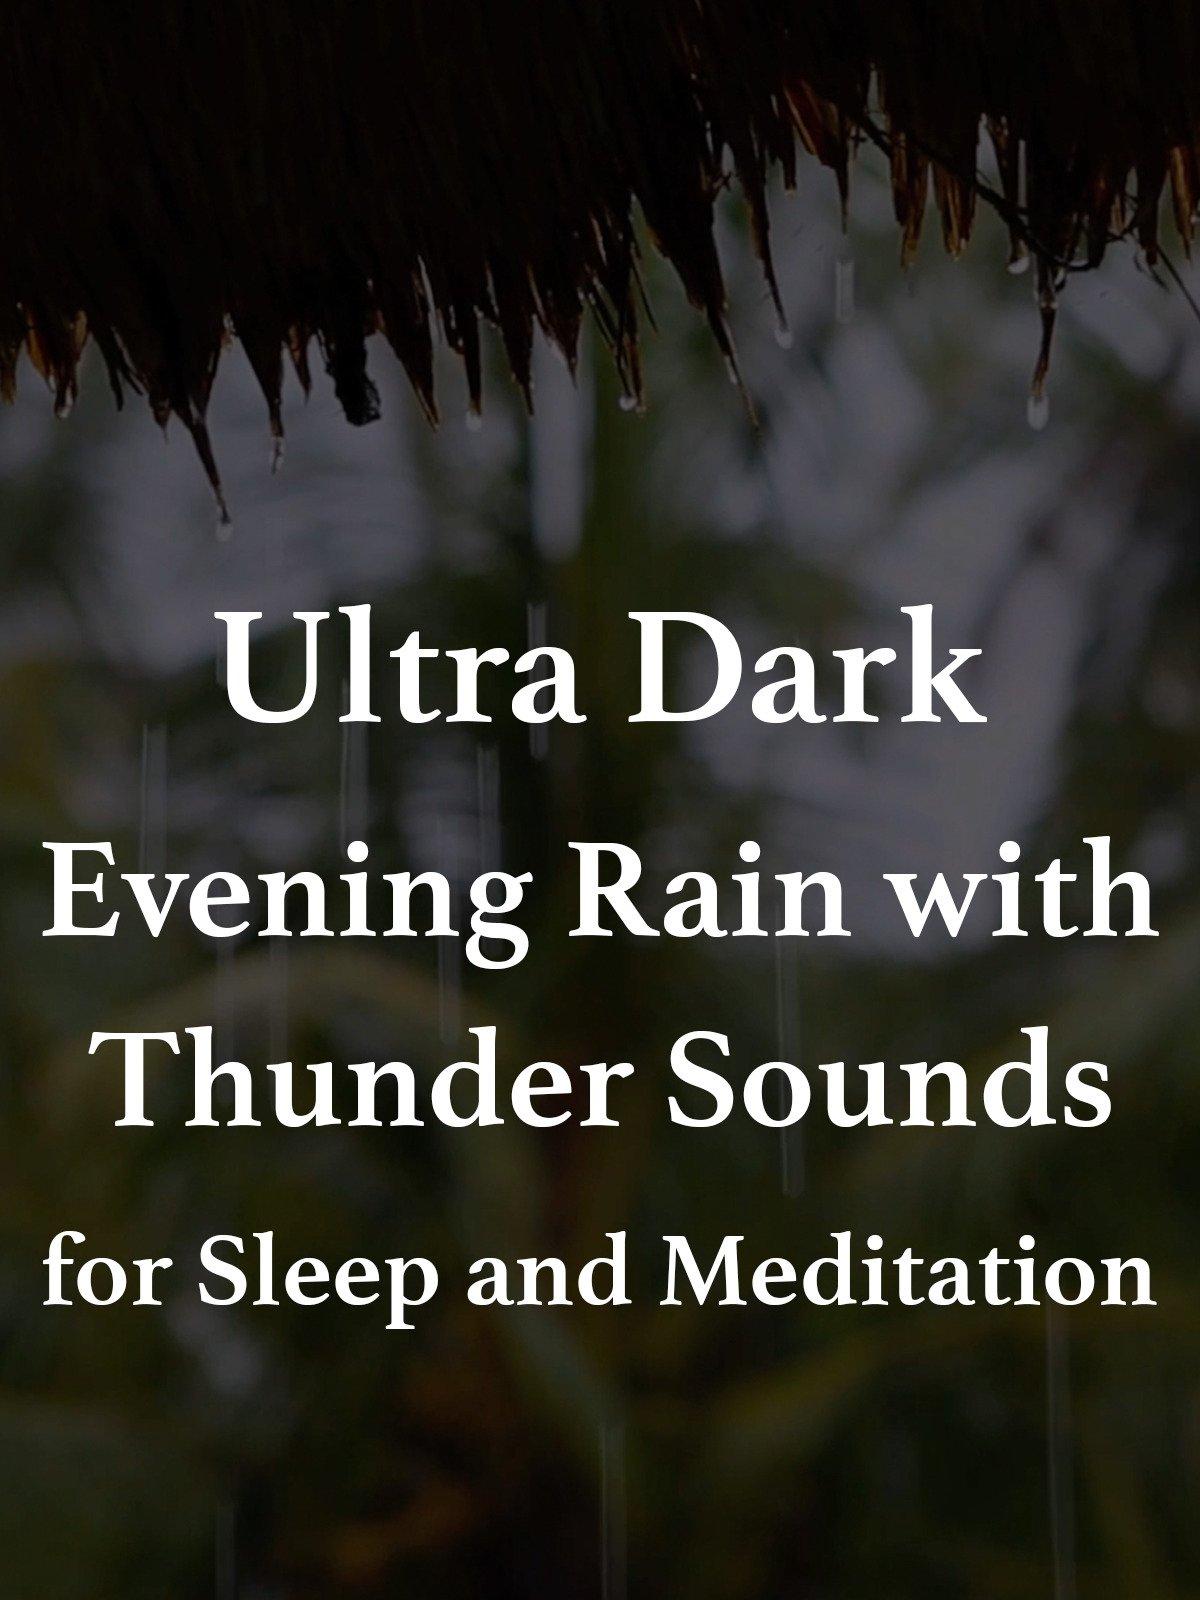 Ultra Dark Evening Rain with Thunder Sounds for Sleep and Meditation